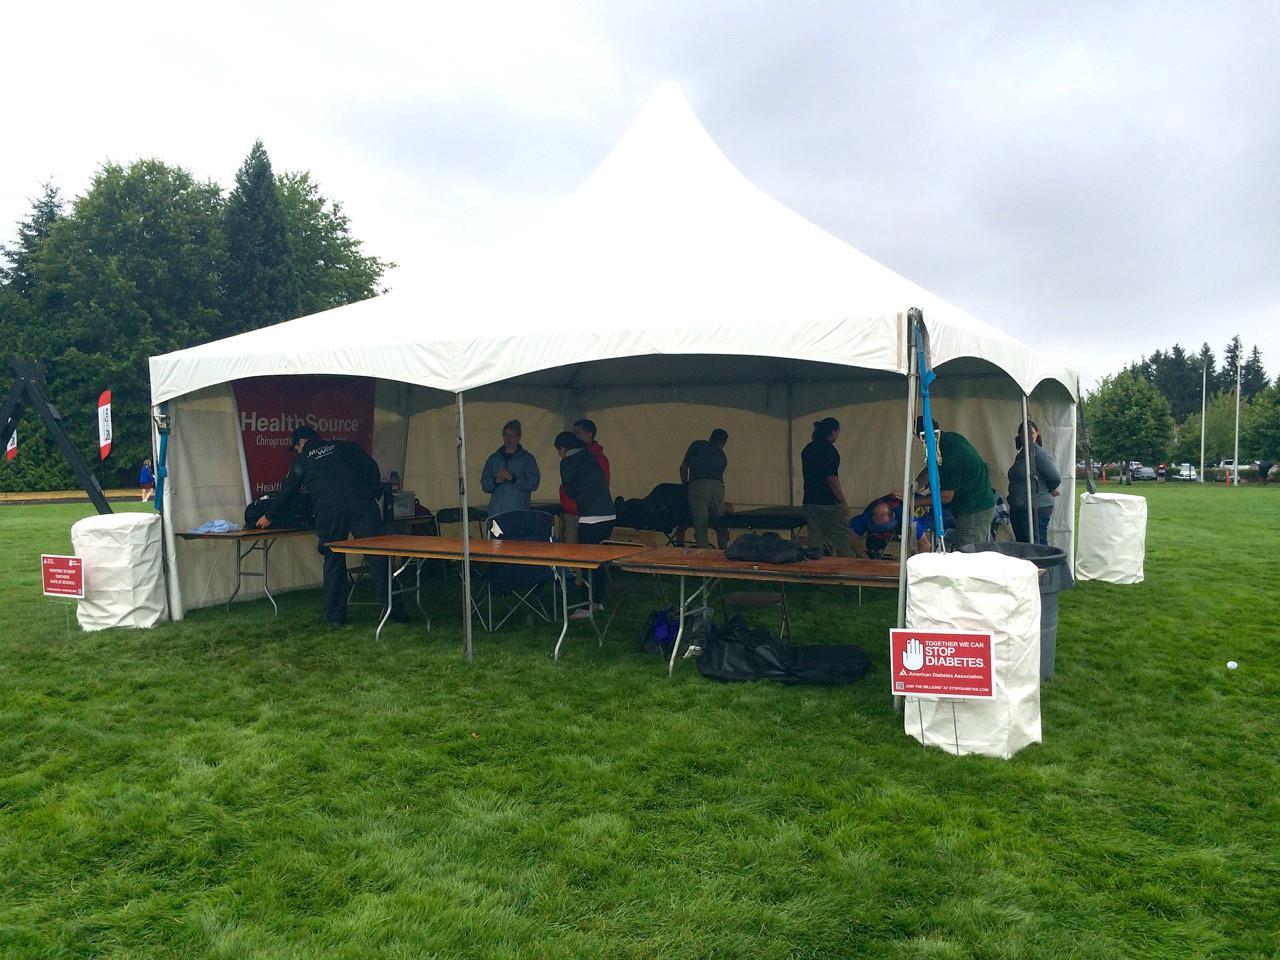 2015 Tour de Cure Oregon, Amberglen Park, Hillsboro.<br /> Massage and medical tent